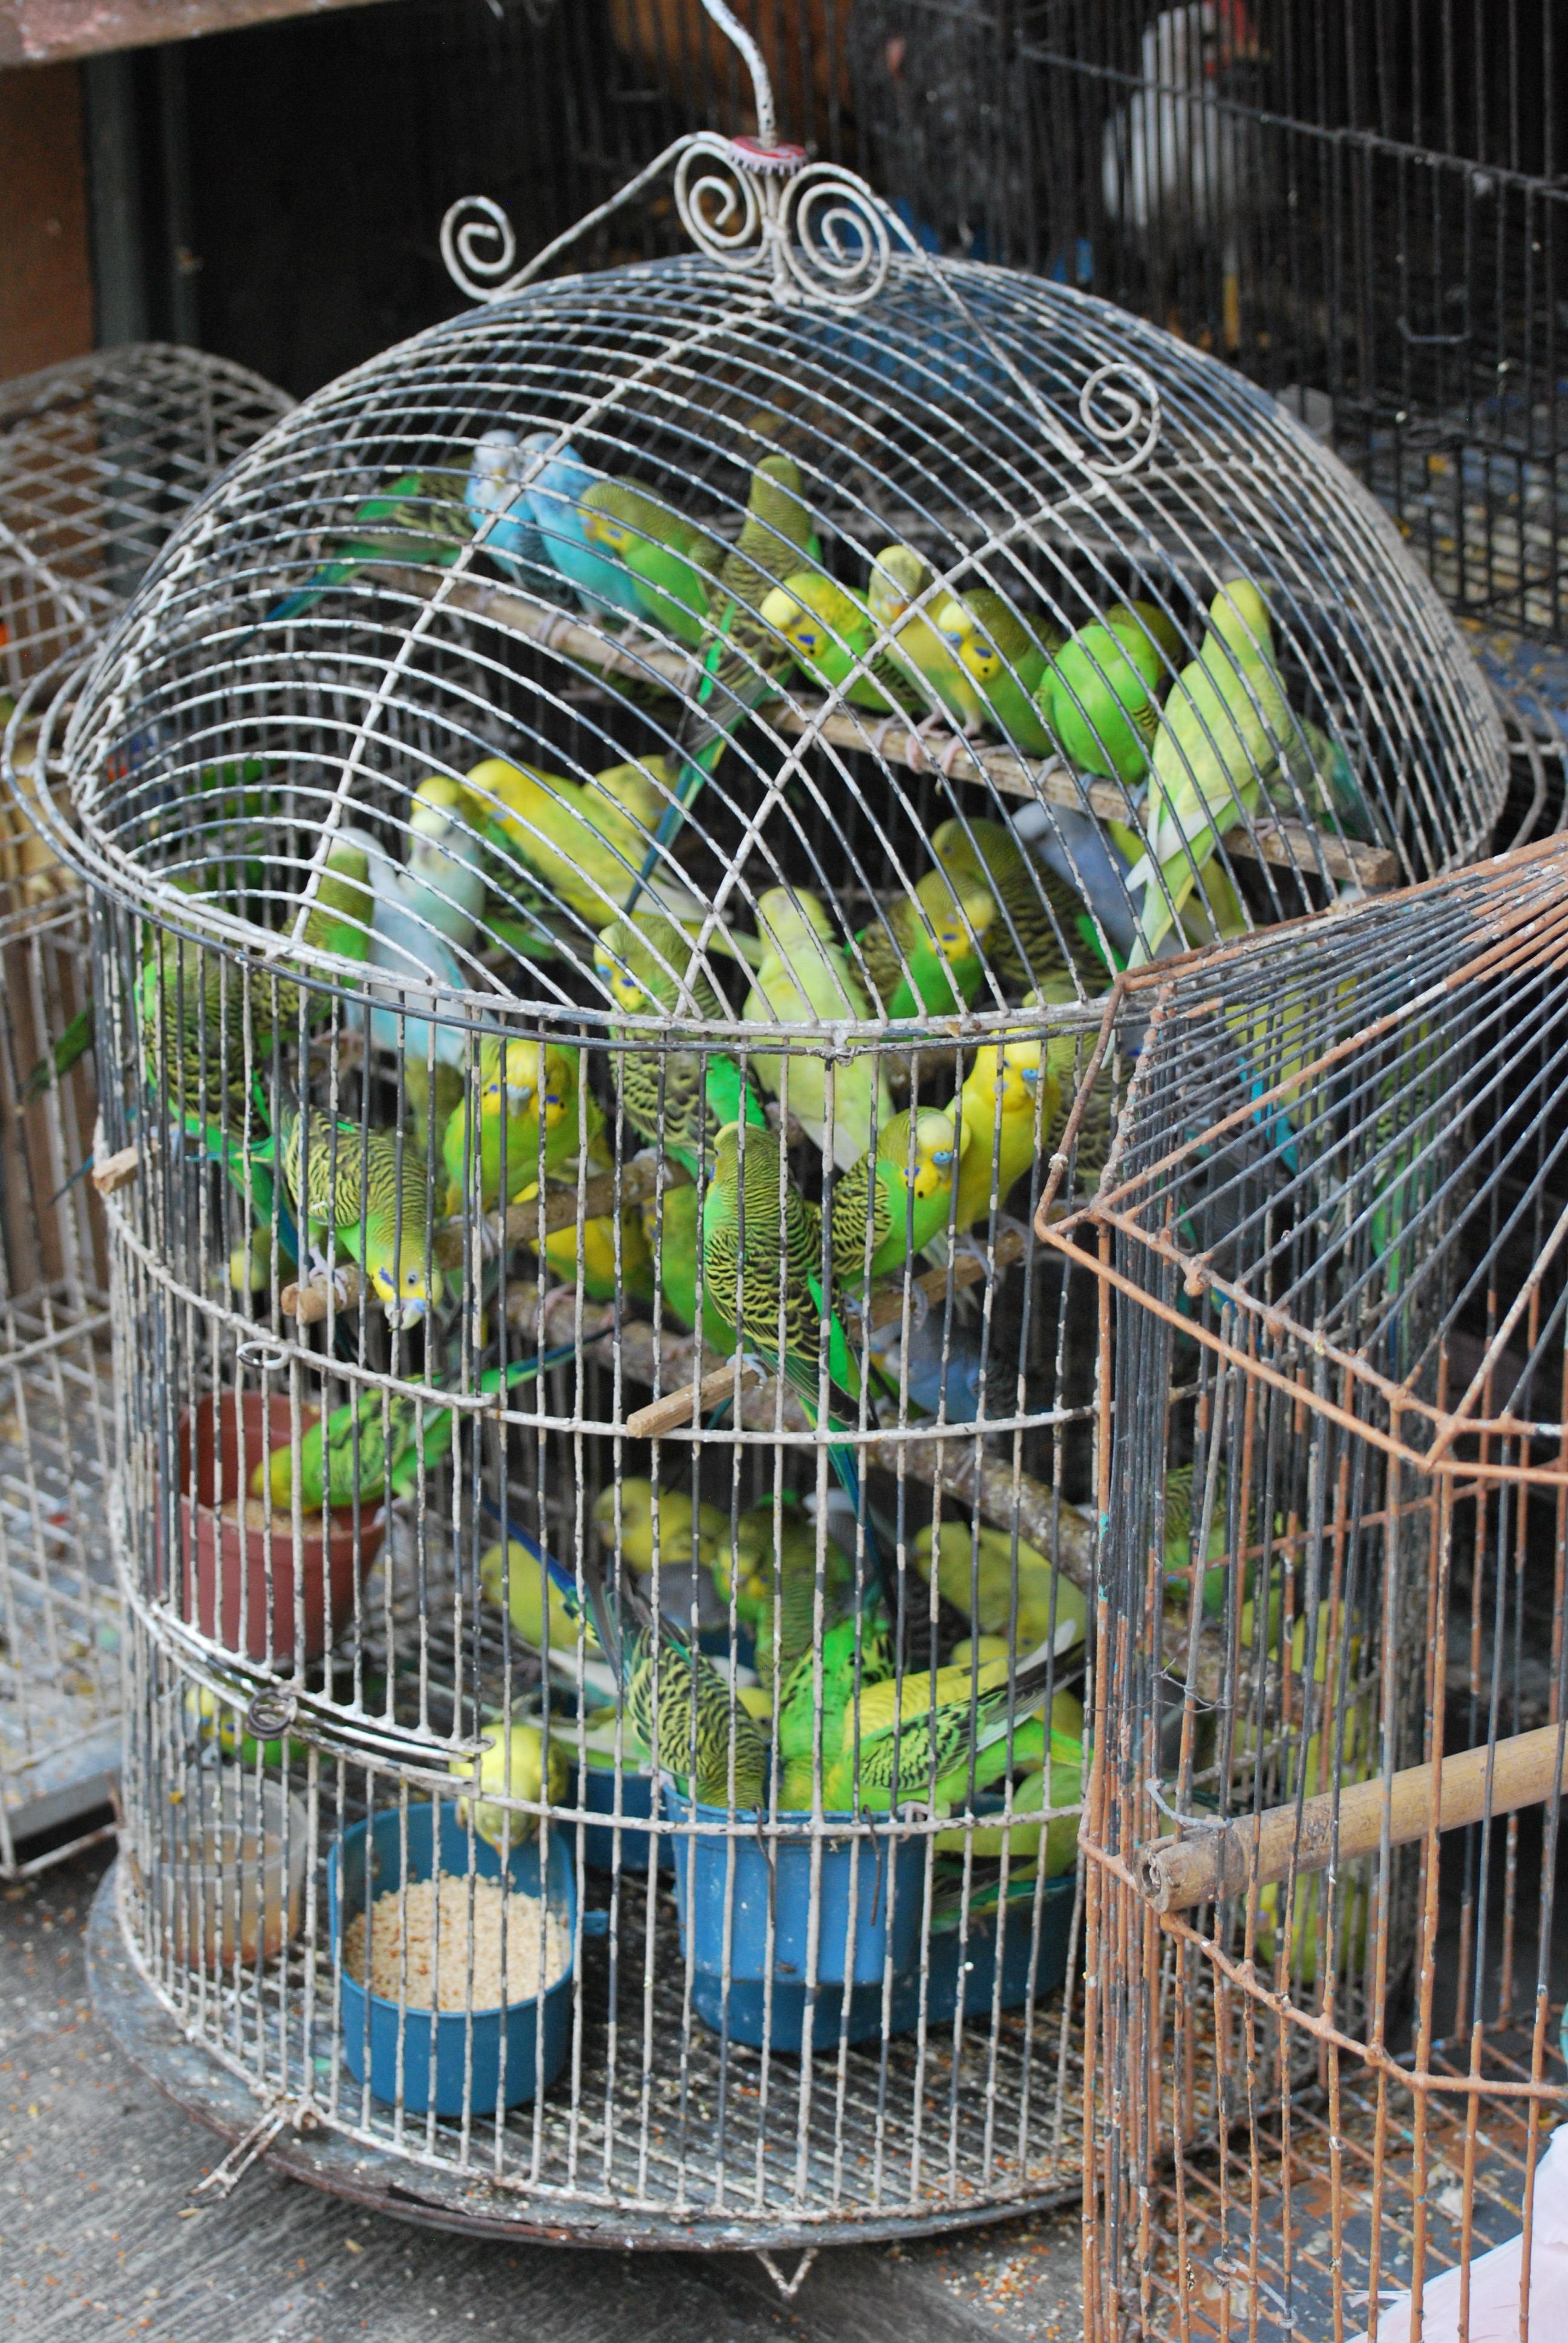 File:Wildlife trade crowded birdsWikimedia Commons